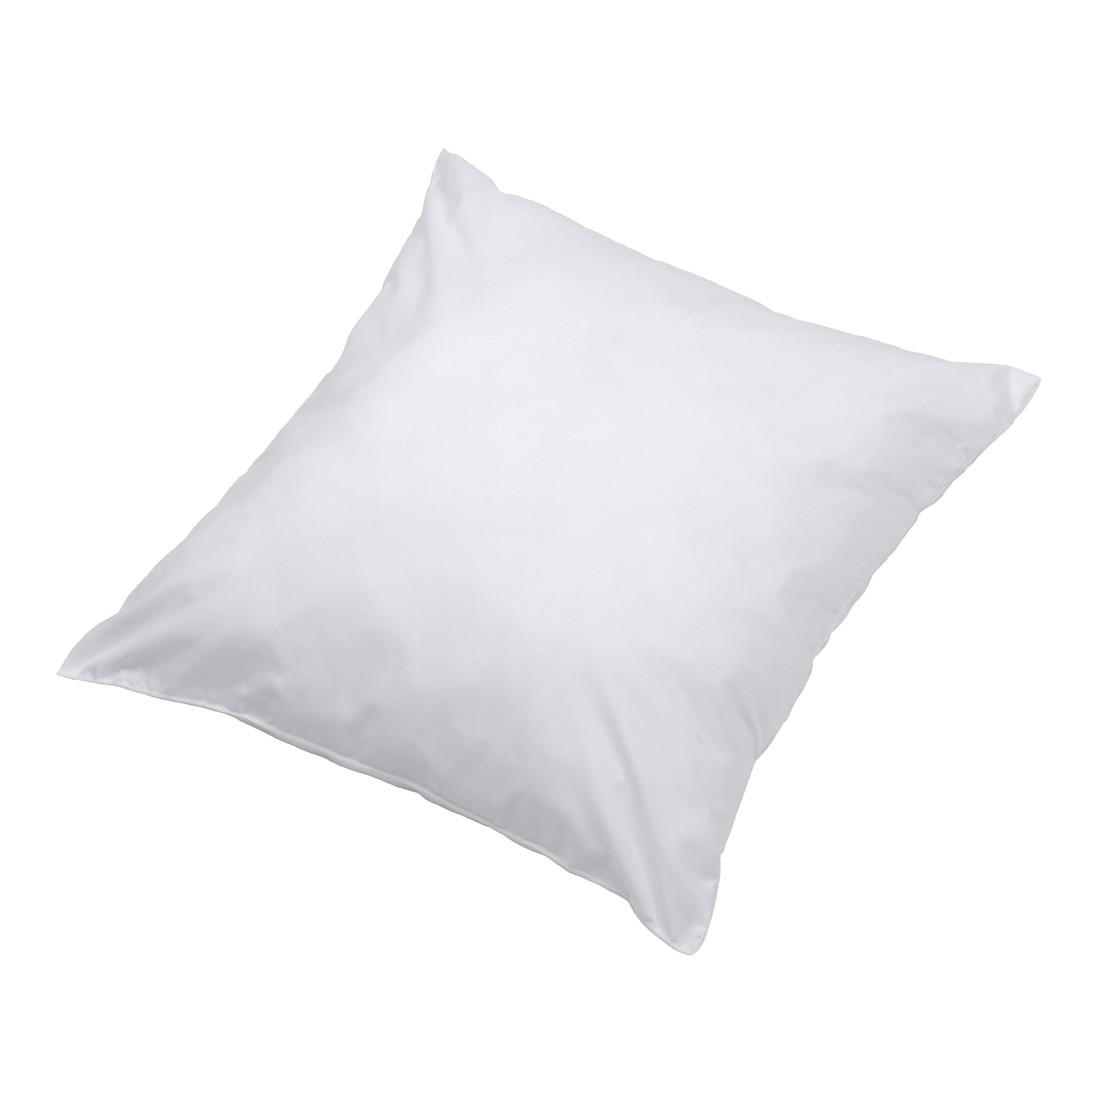 Kissen Nova Dream Bronce – glatt – 50 x 50 cm, Nova Dream Sleepline günstig bestellen